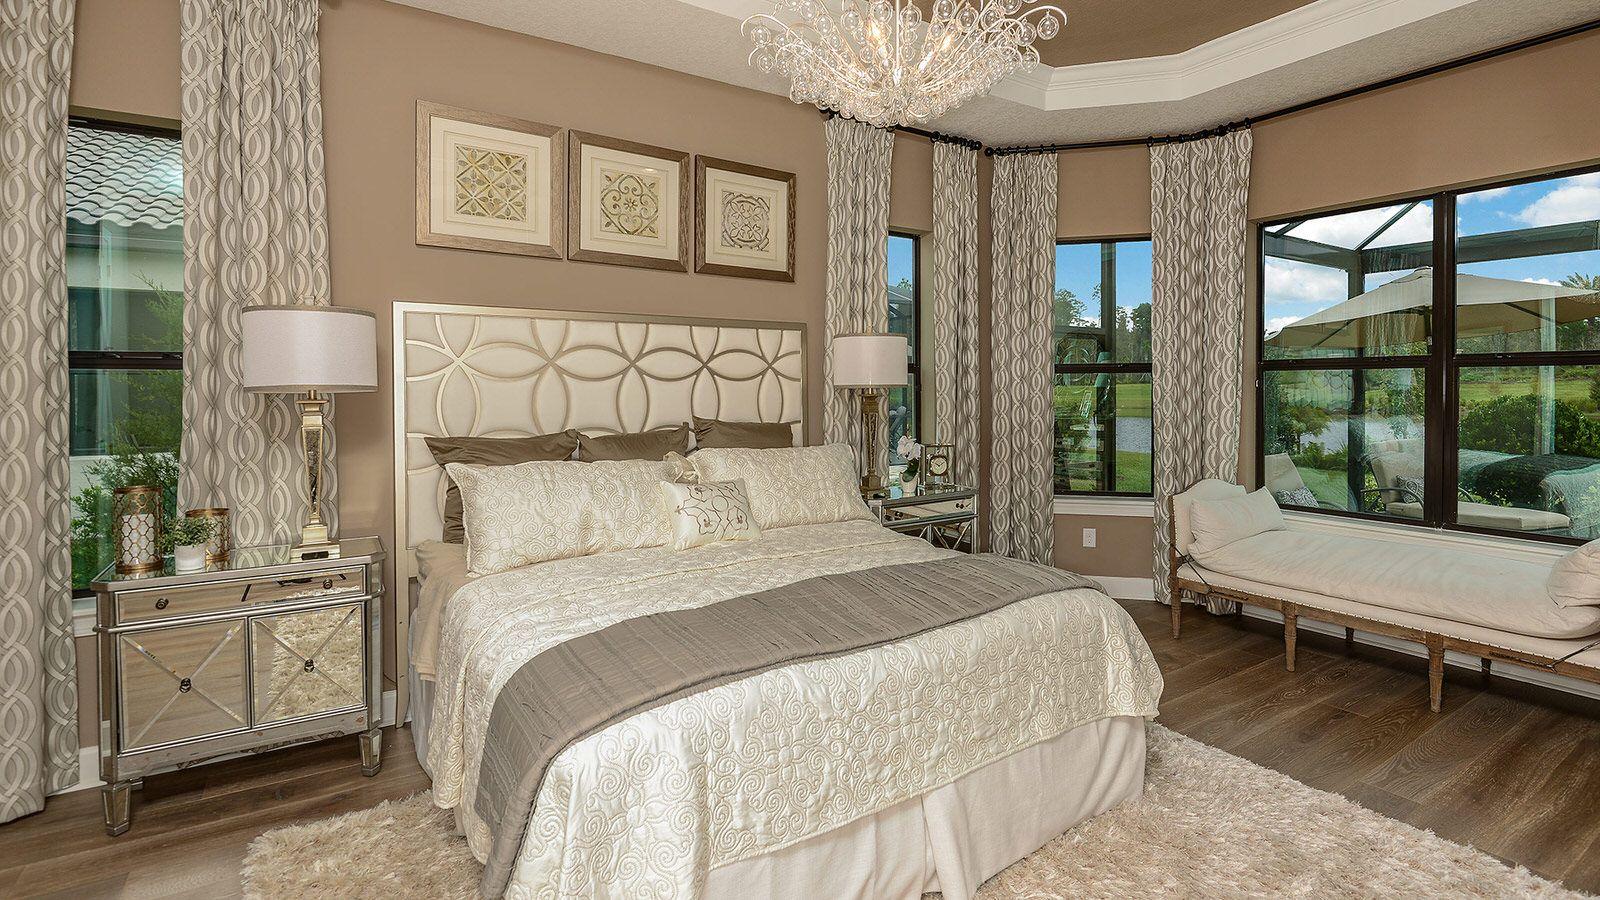 Bedroom featured in the Lazio 3 car By Taylor Morrison in Sarasota-Bradenton, FL